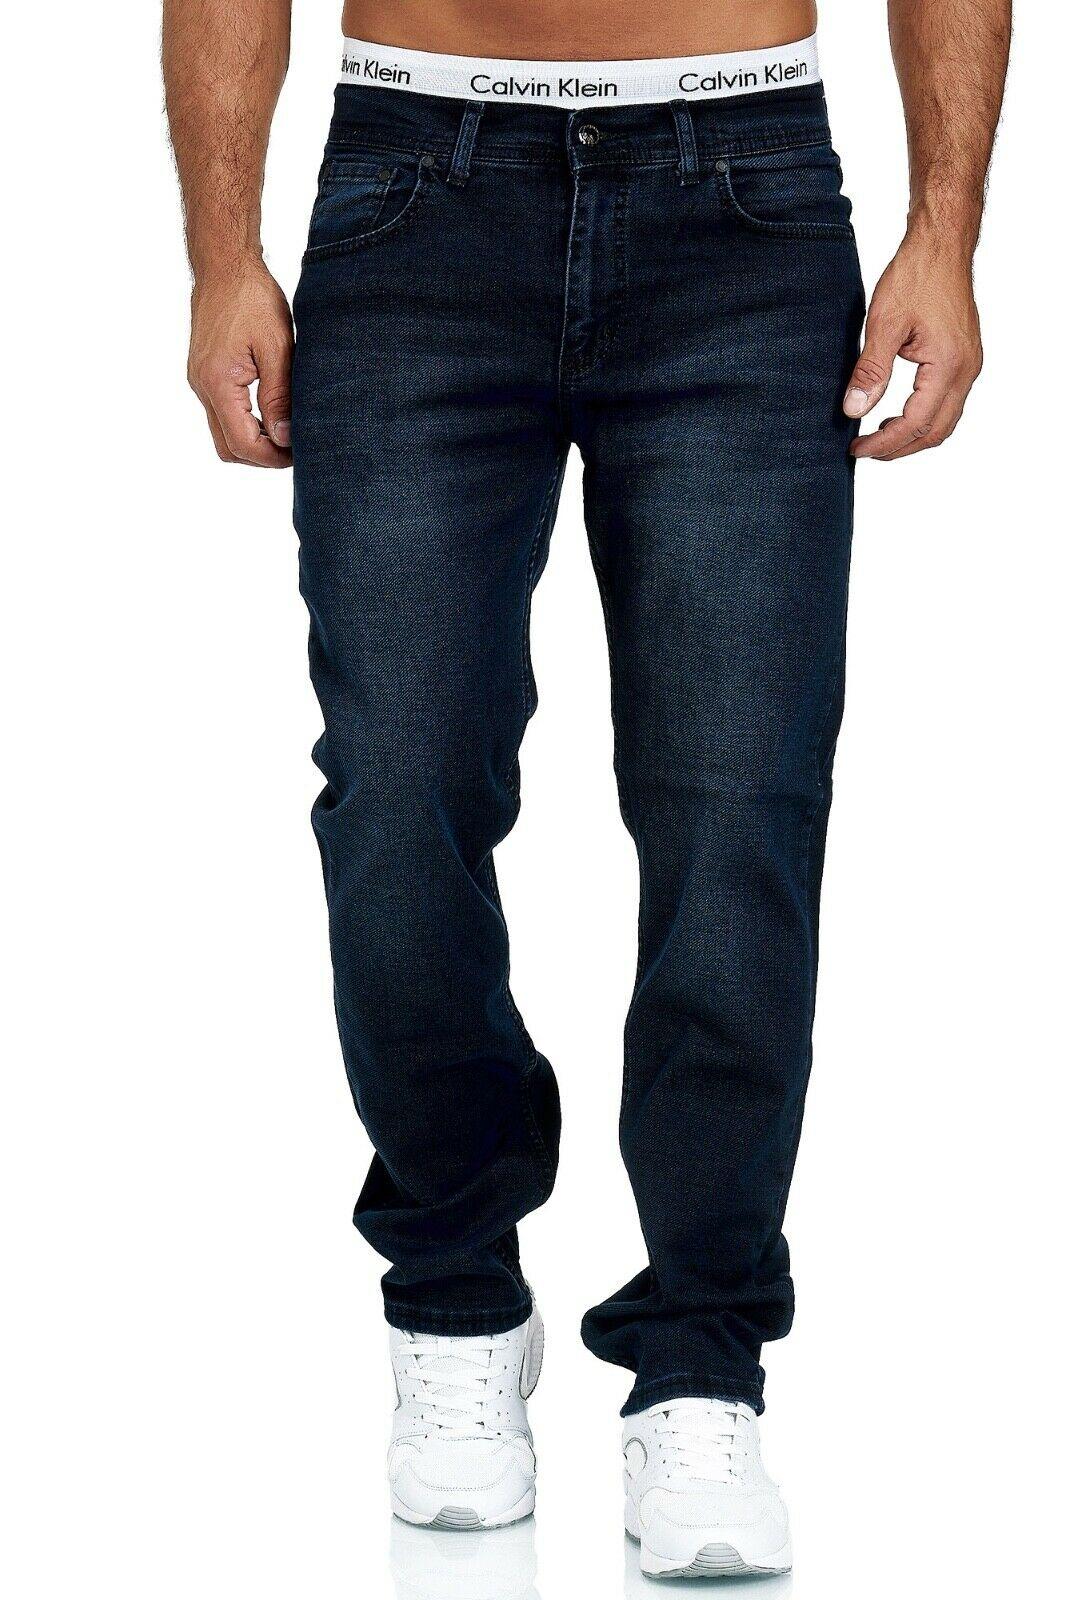 Herren-Jeans-Hose-Denim-KC-Black-Washed-Straight-Cut-Regular-Dicke-Naht-naehte Indexbild 86